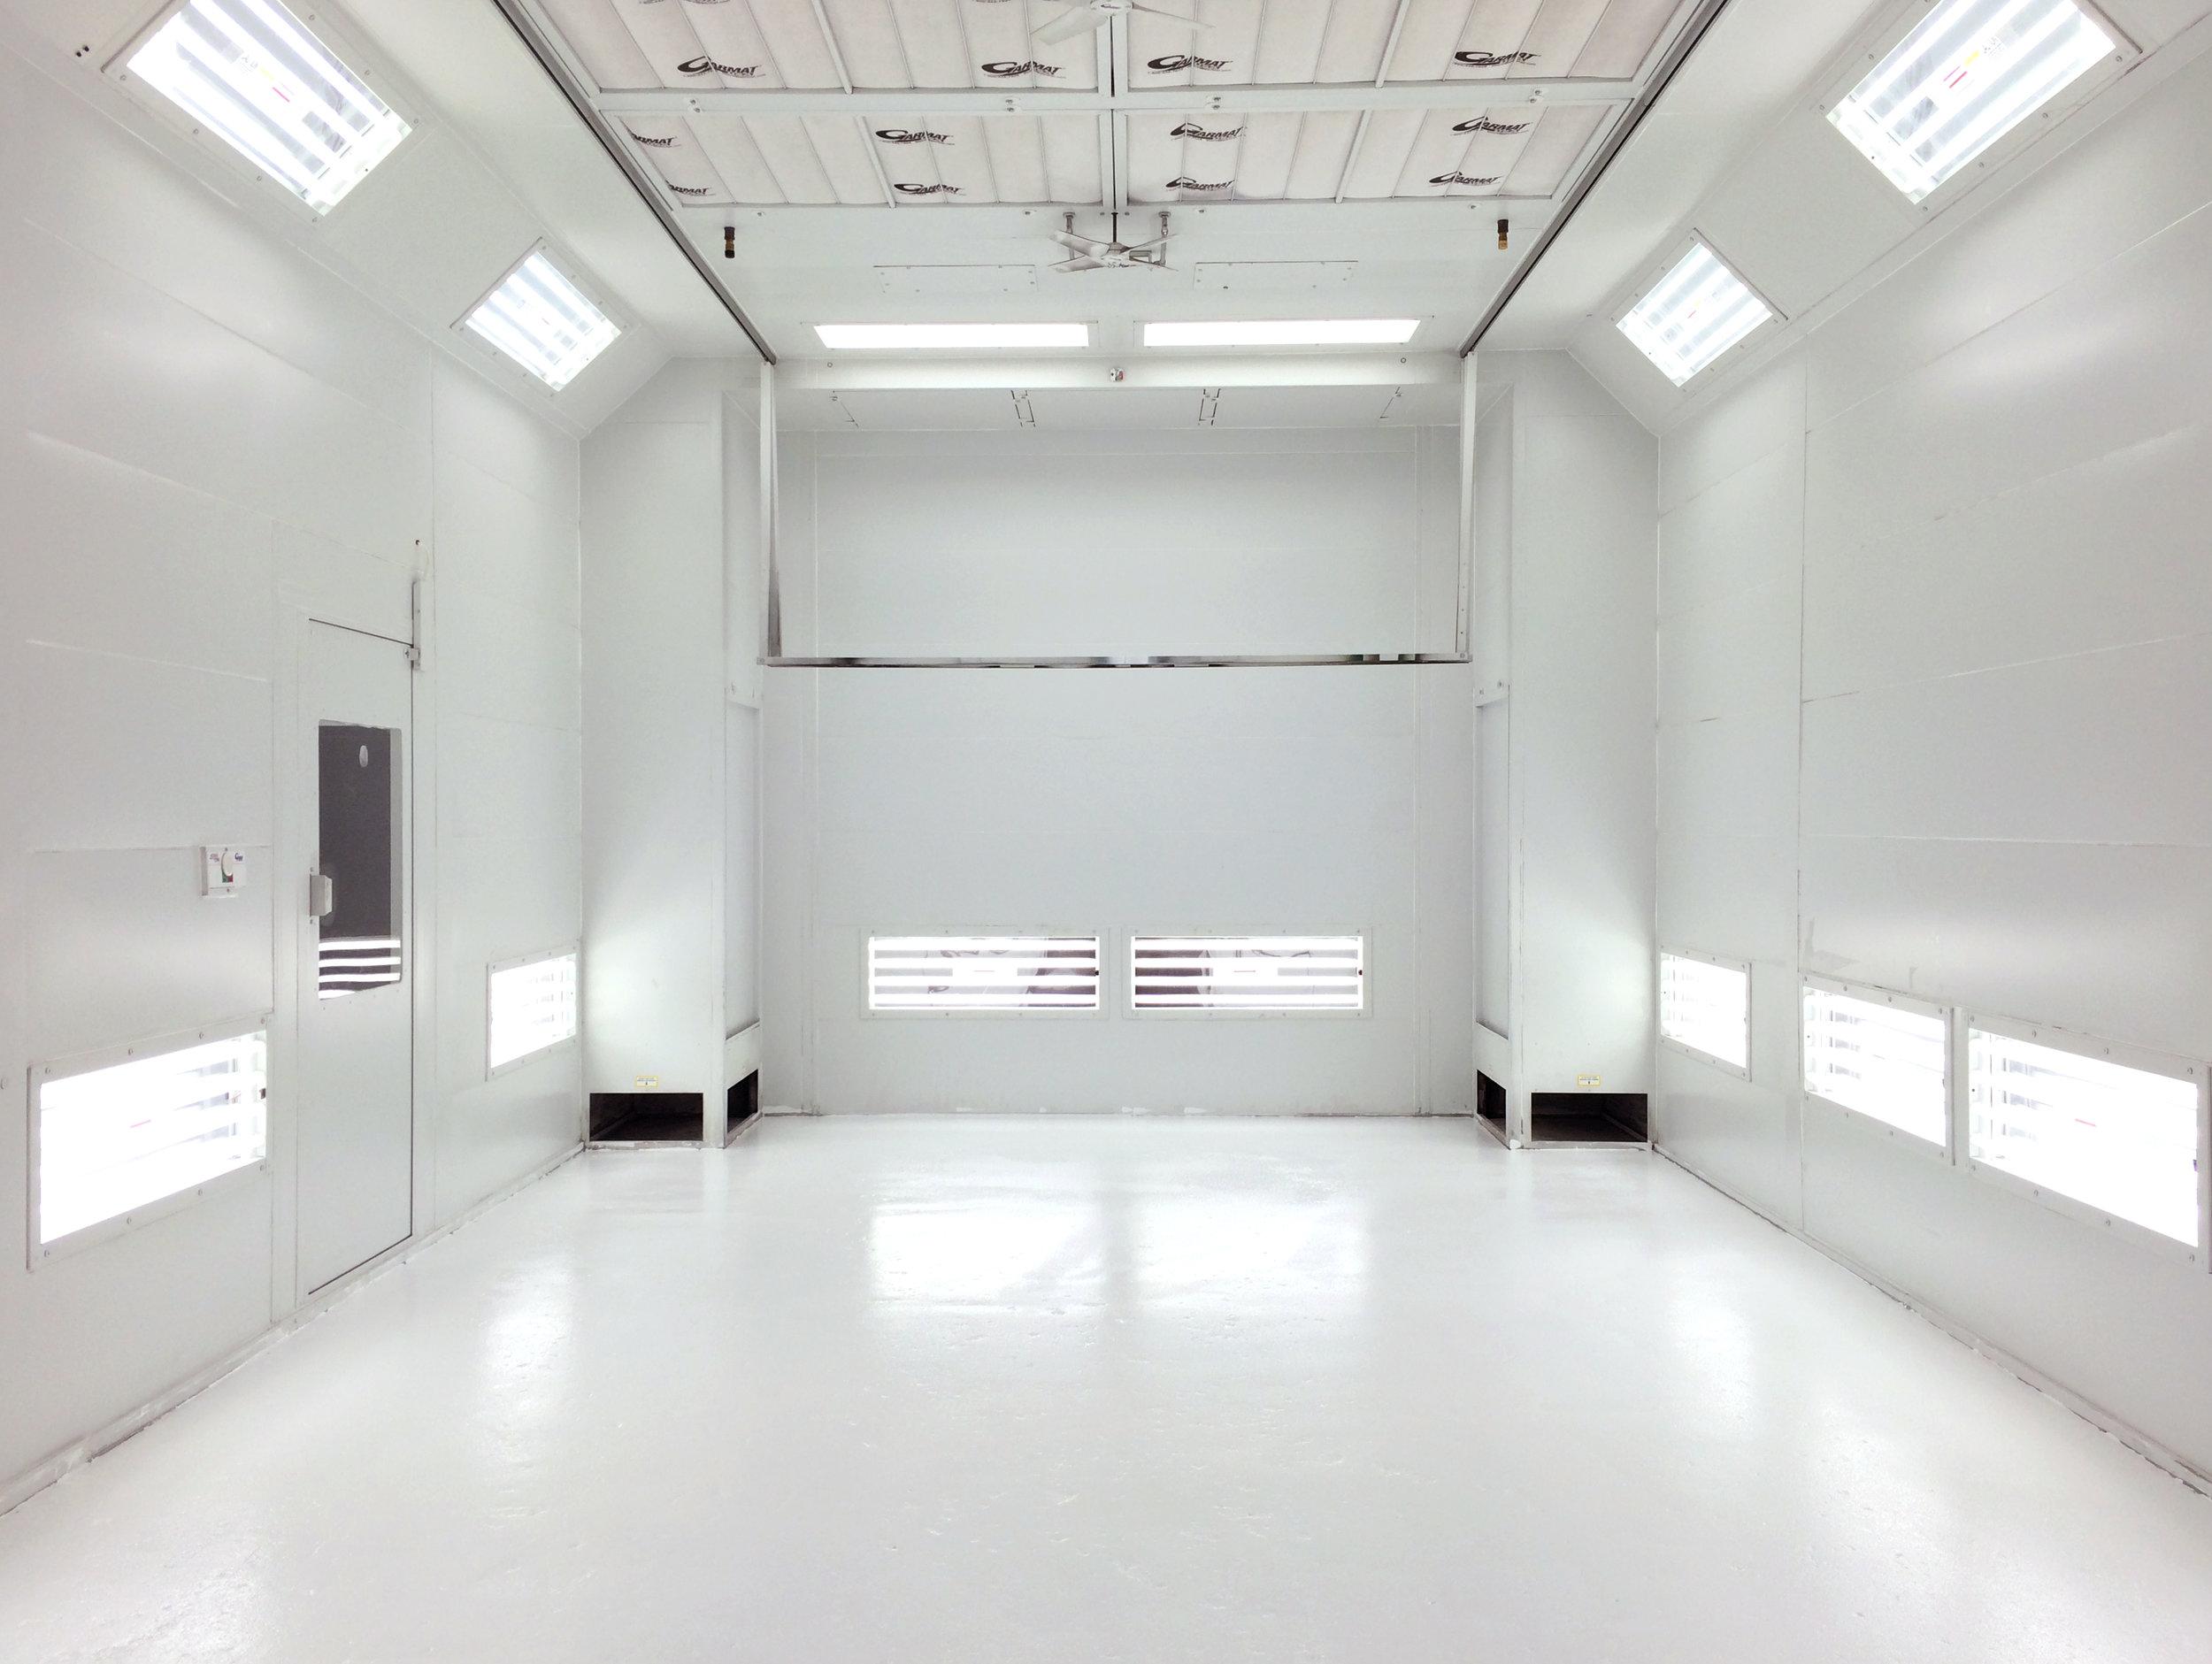 Garmat paint booth